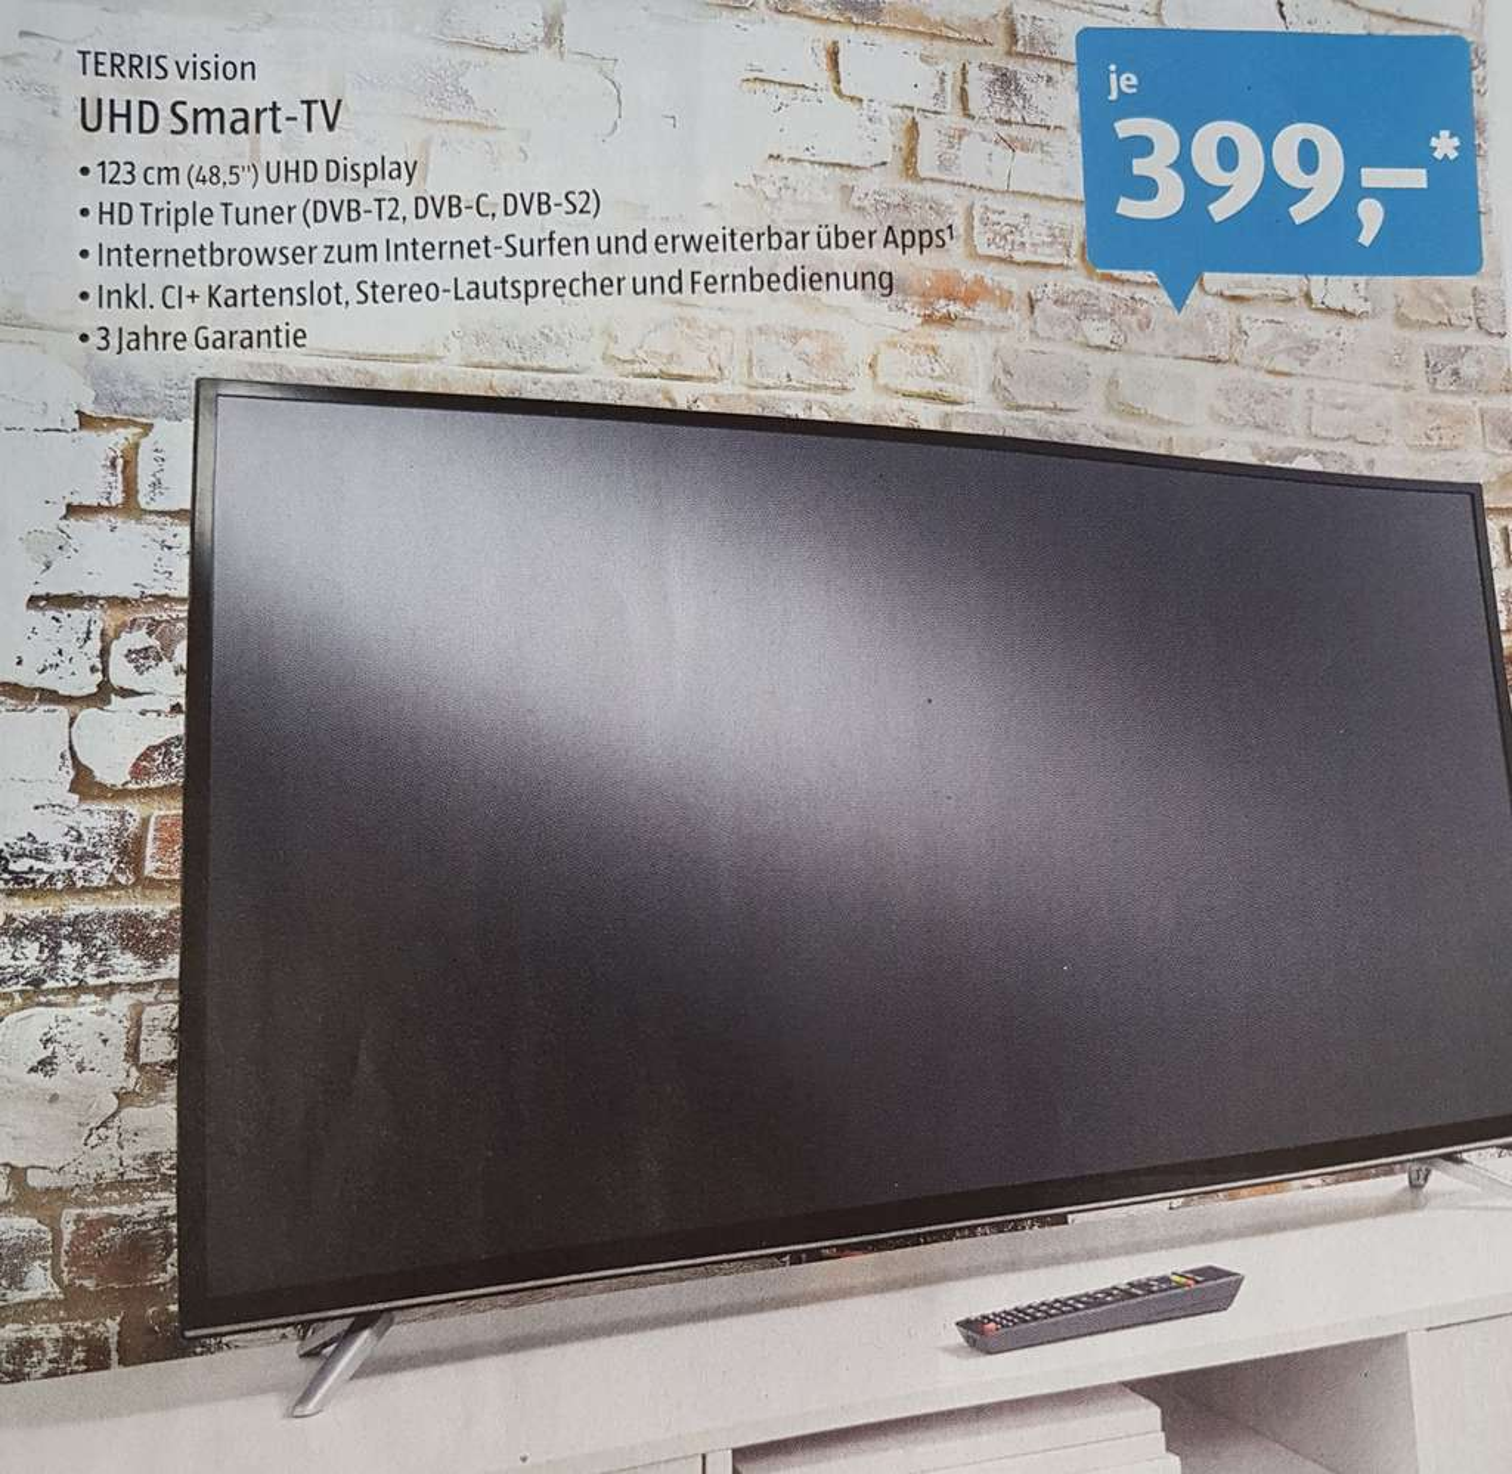 aldi s d terris vision uhd smart tv 48 5 zoll. Black Bedroom Furniture Sets. Home Design Ideas